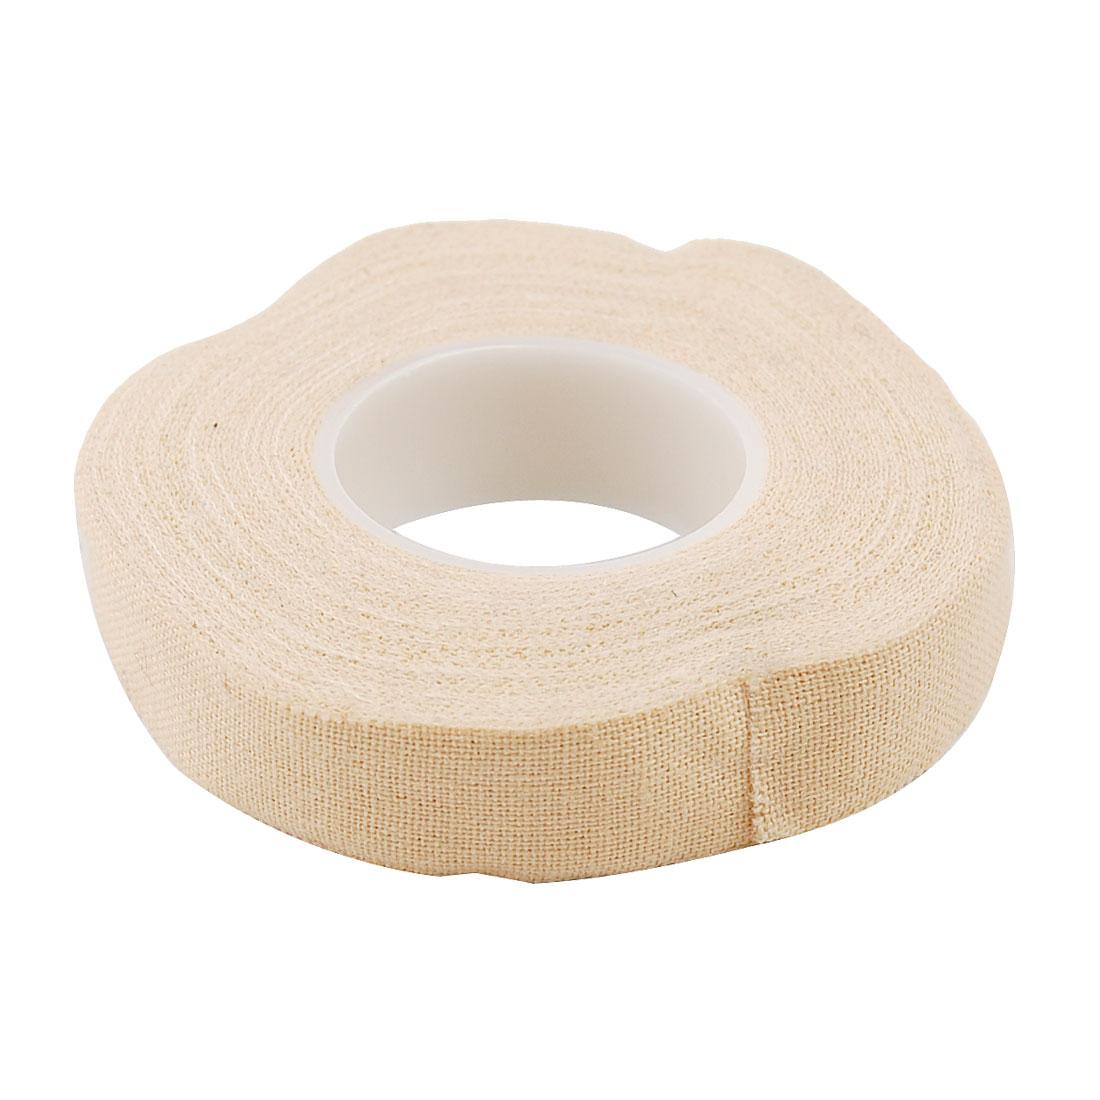 Guzheng Pipa Zither Chinese Lute Accessory Peachpuff Adhesive Tape Roll